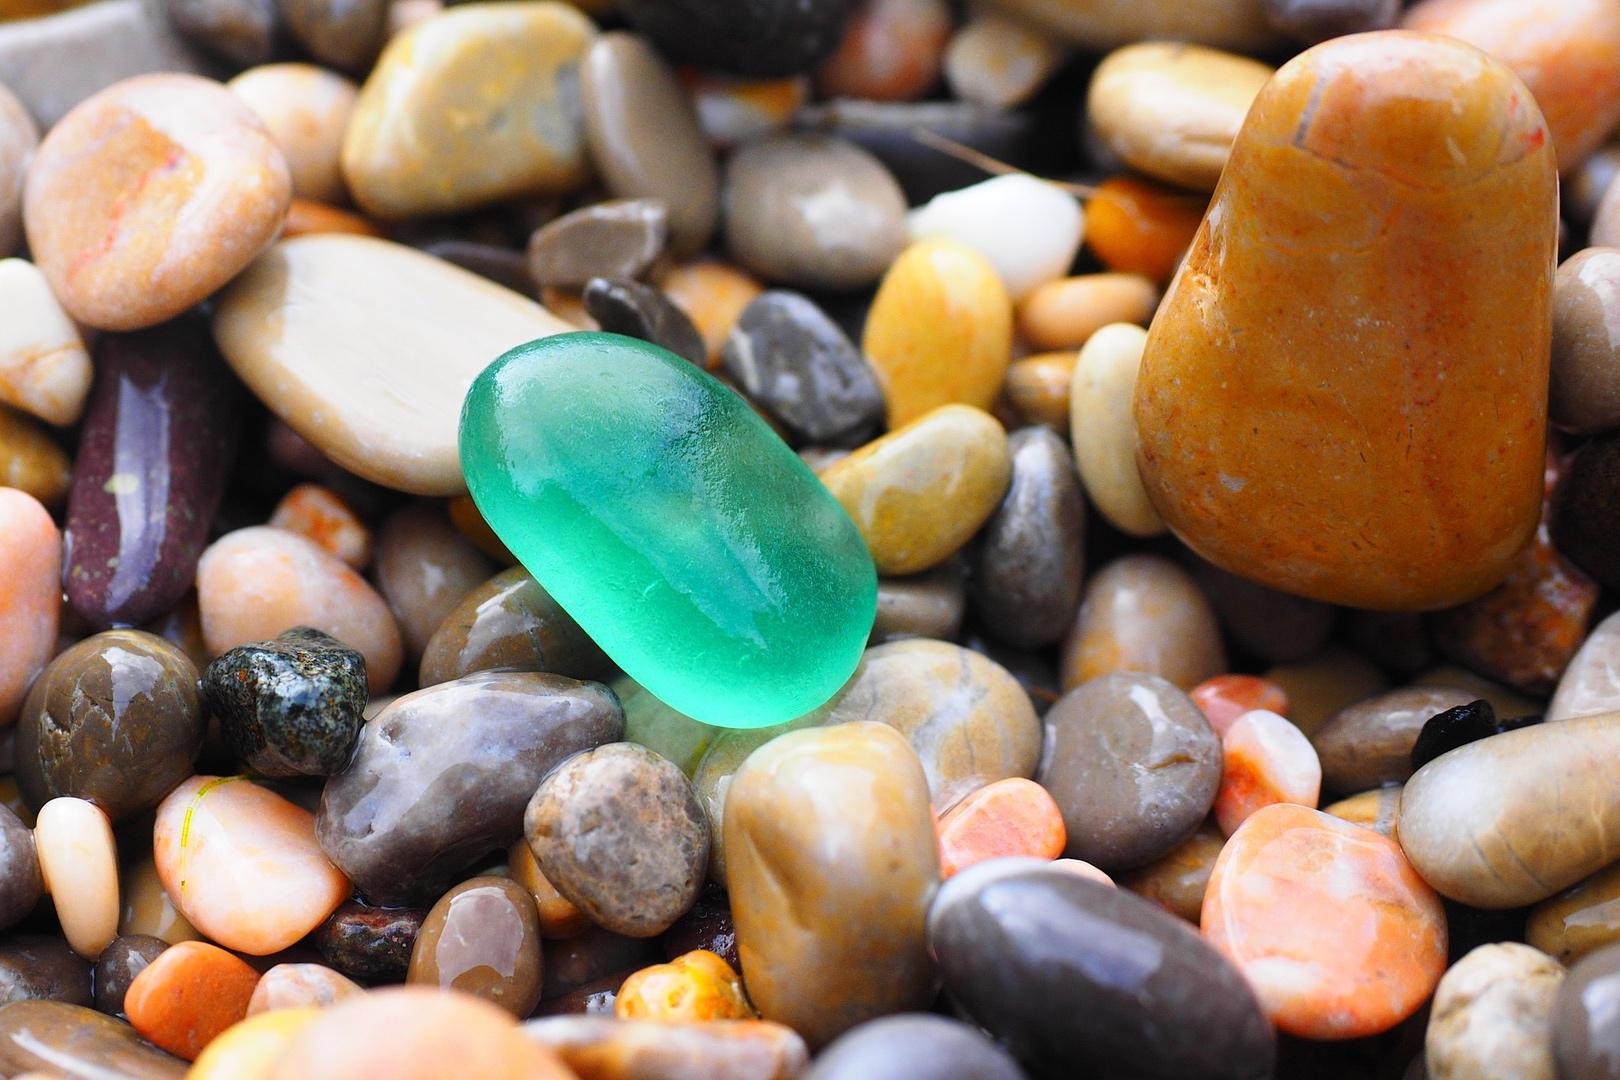 pebbles-1090536_1920.jpg